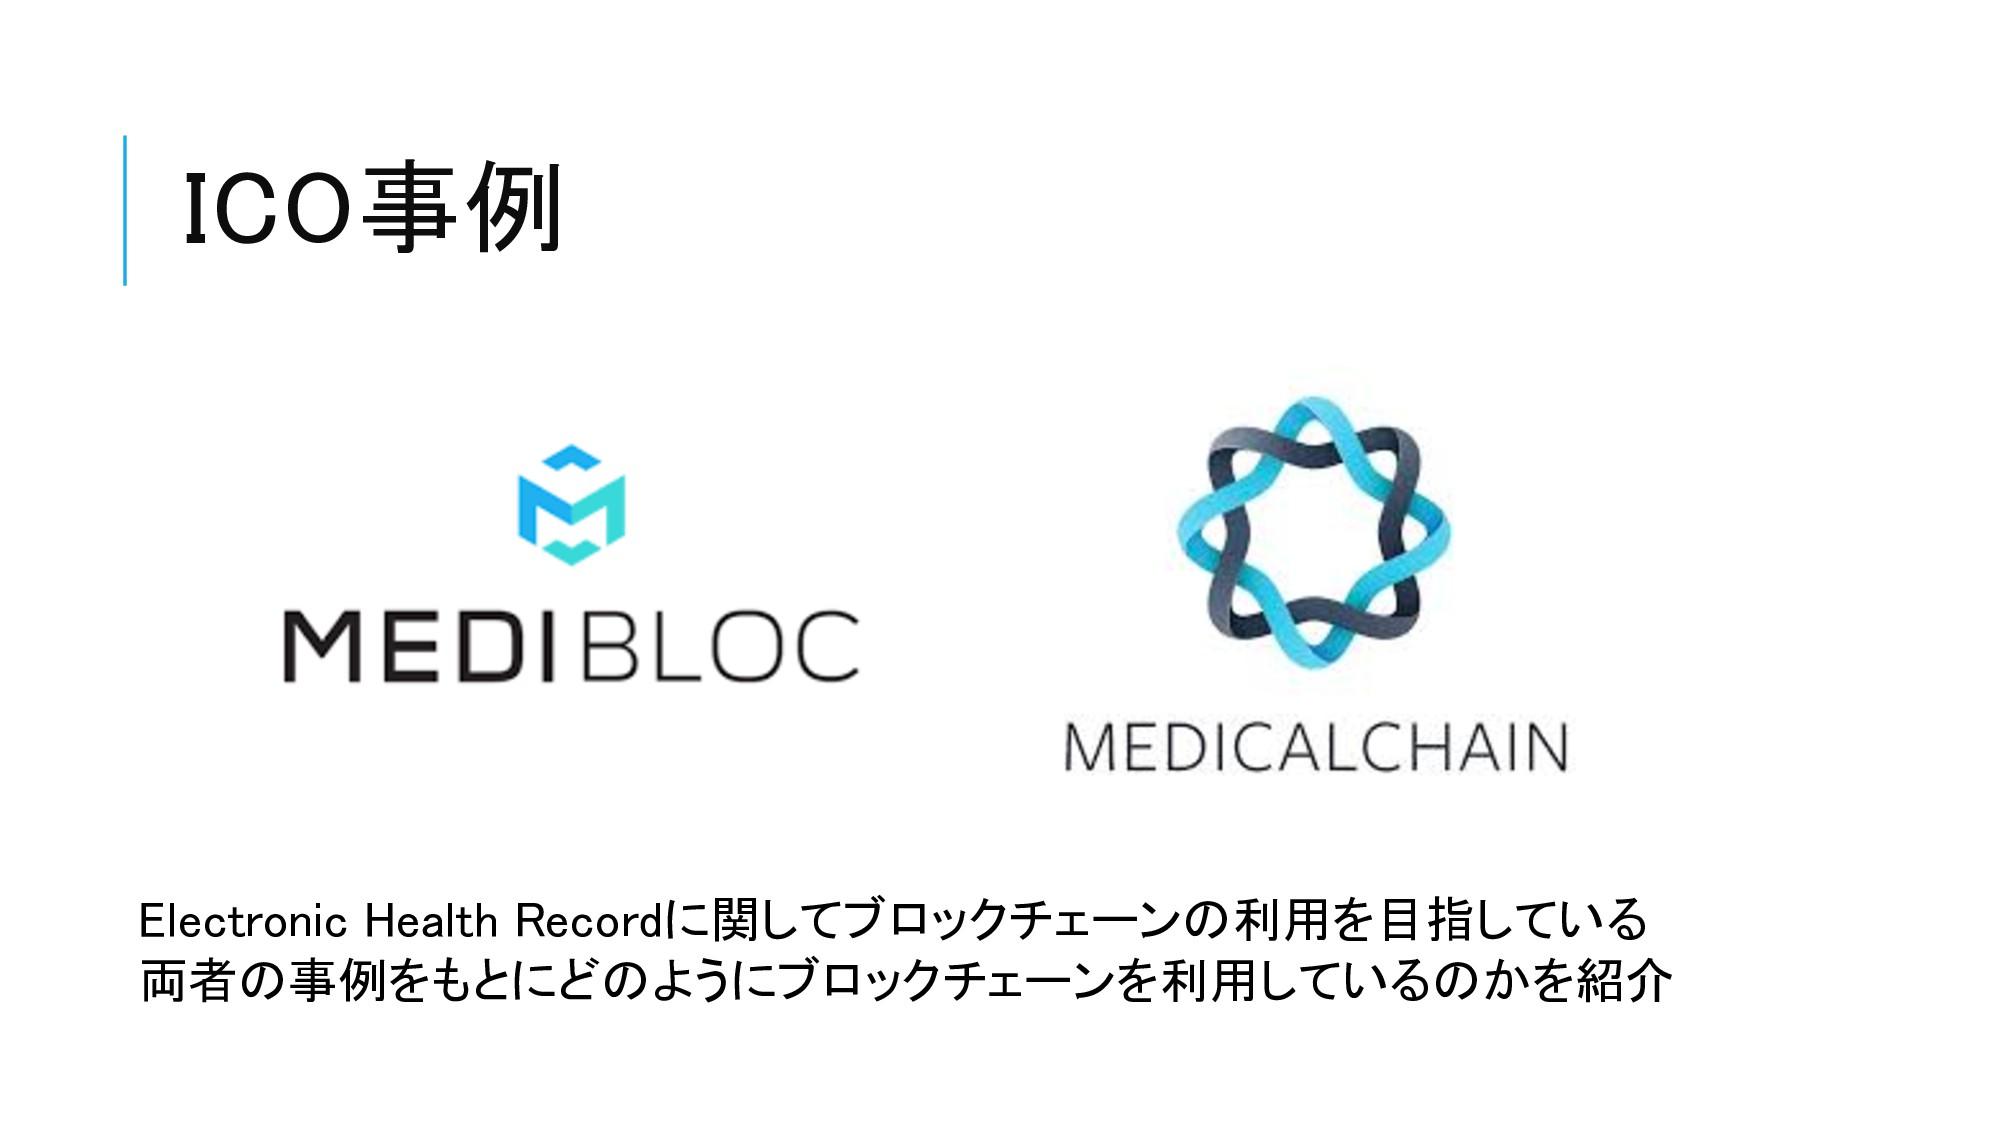 ICO事例 Electronic Health Recordに関してブロックチェーンの利用を目...